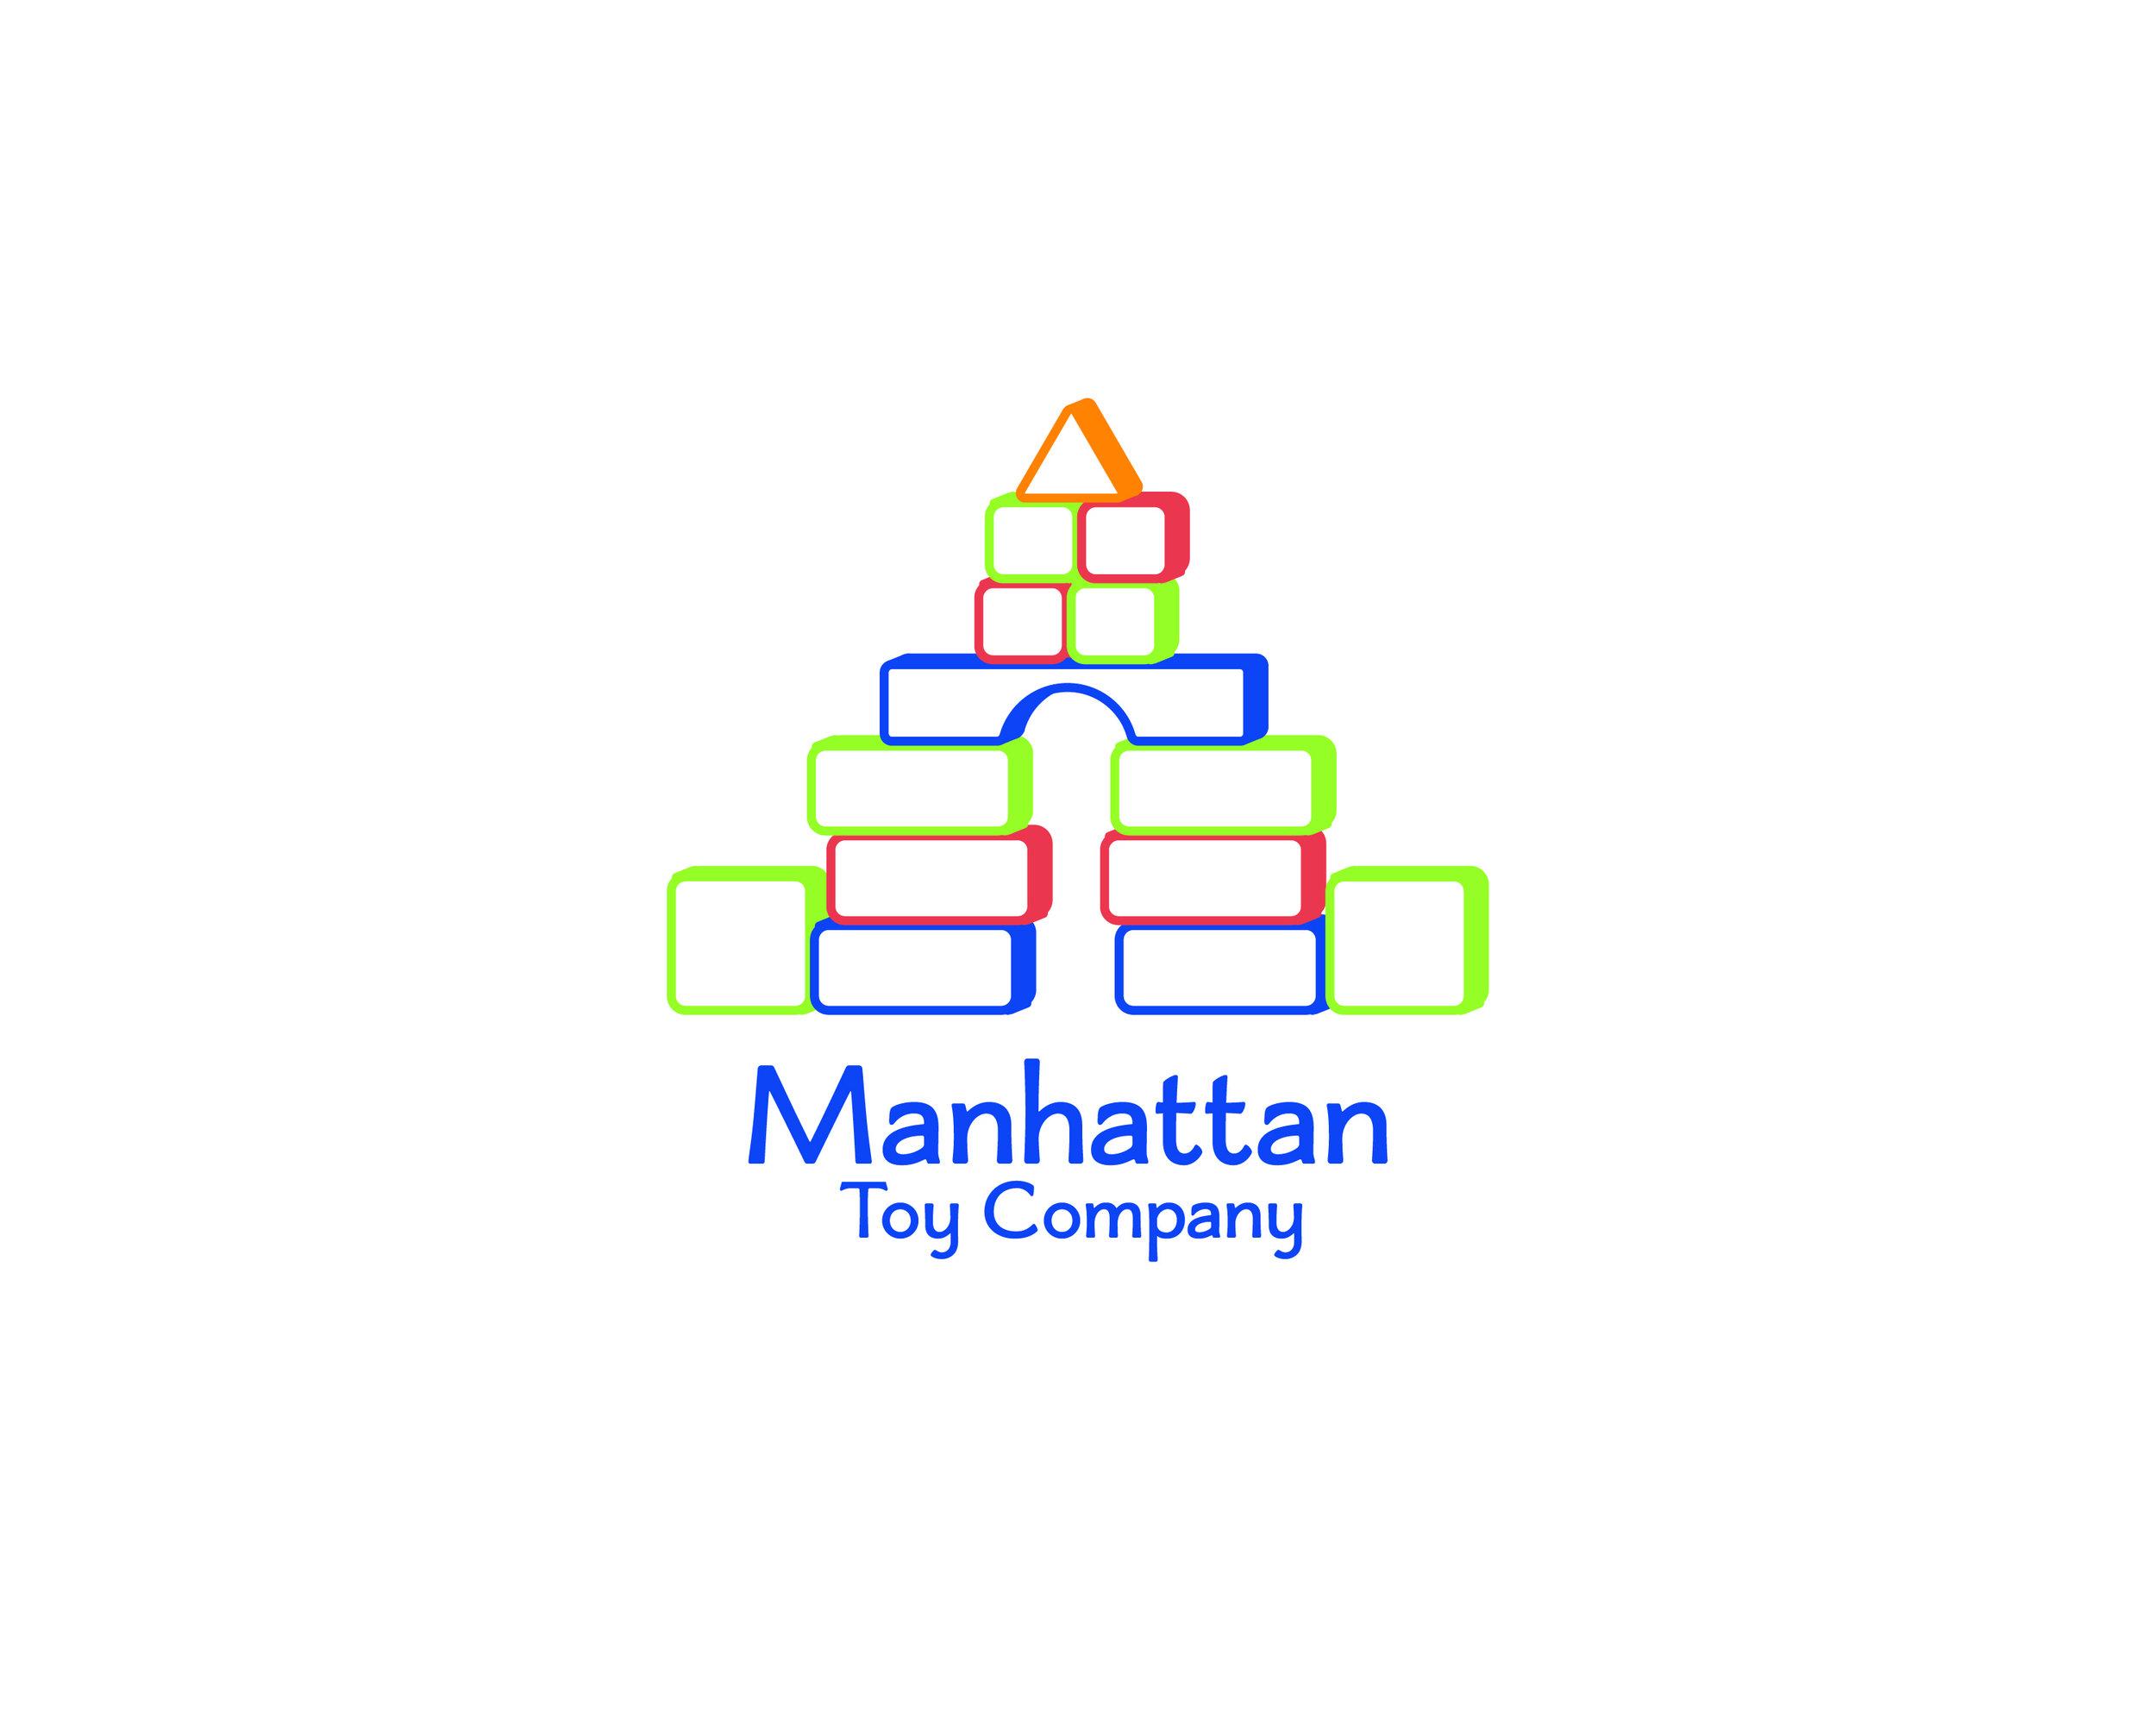 Manhattan Toy Company-01.jpg